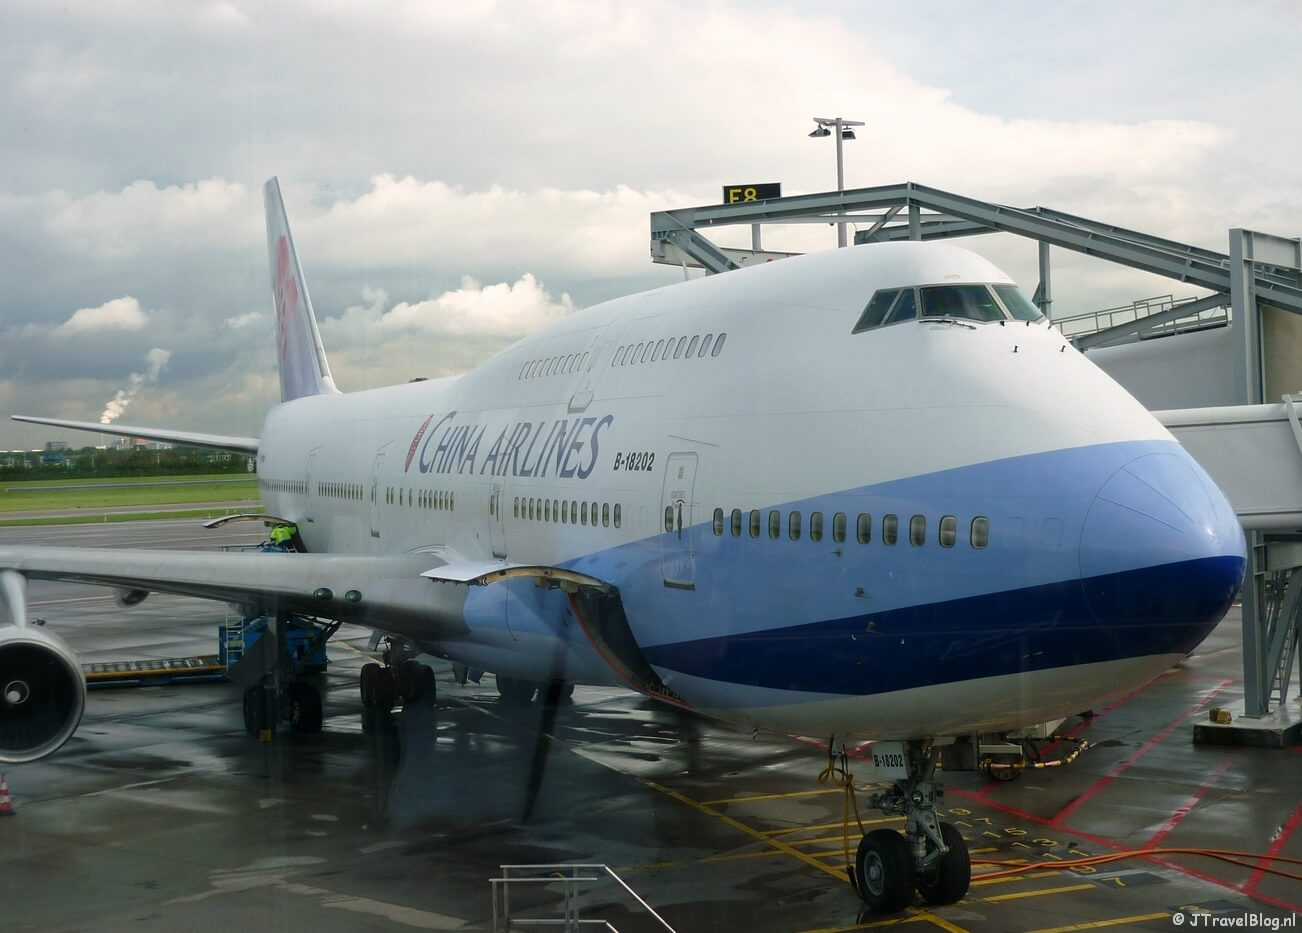 Vliegtuig van China Airlines naar Bangkok